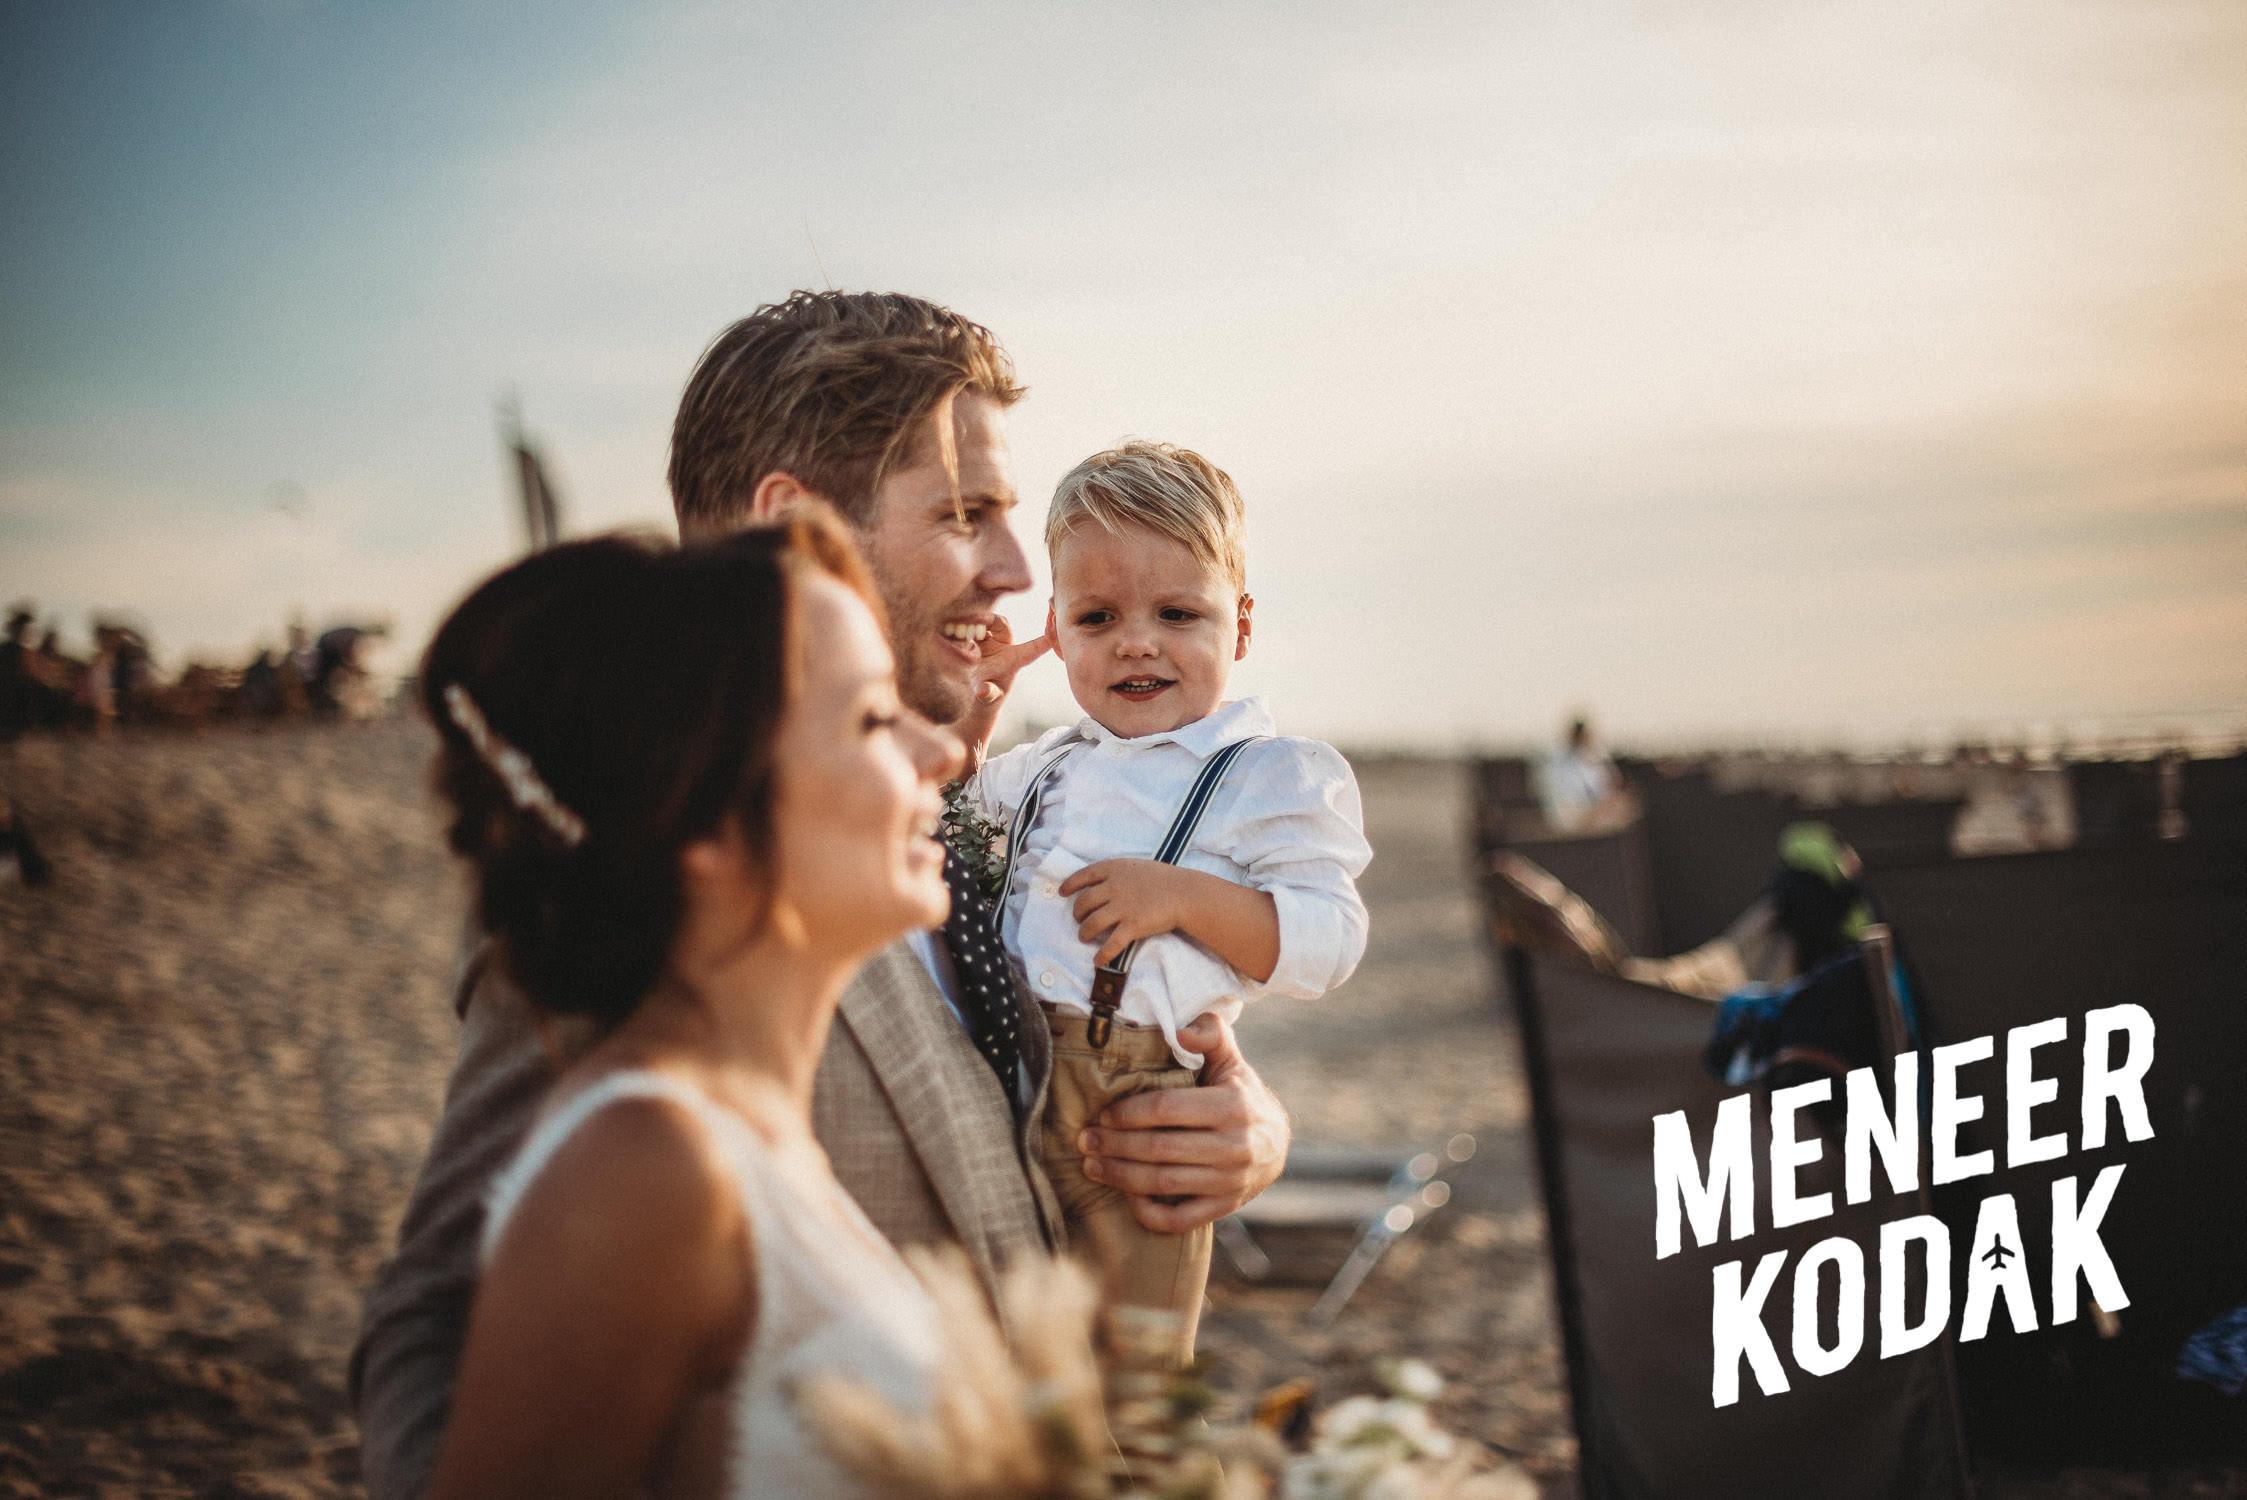 Meneer Kodak - Strandbruiloft - Noordwijk - K&A-112.jpg